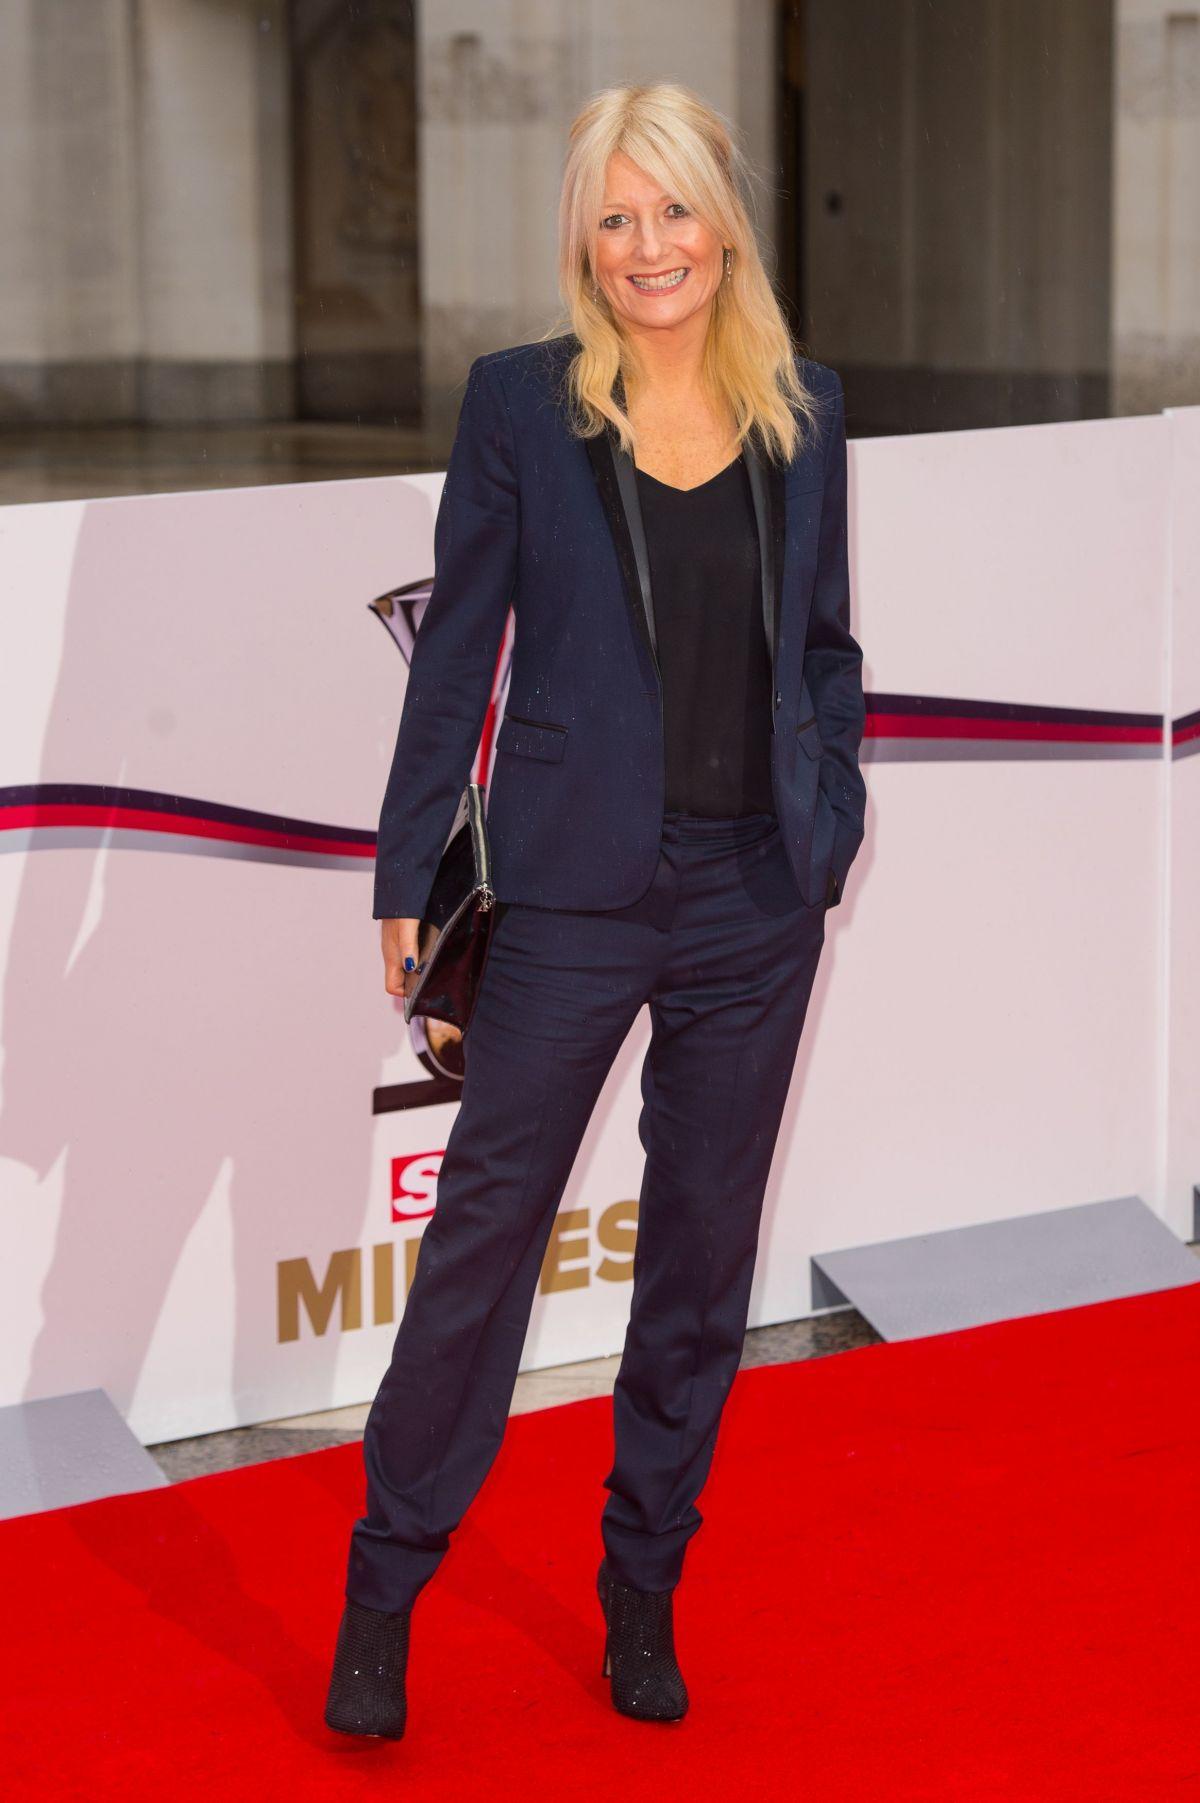 GABY ROSLIN at The Sun Military Awards in London 01/22/2016